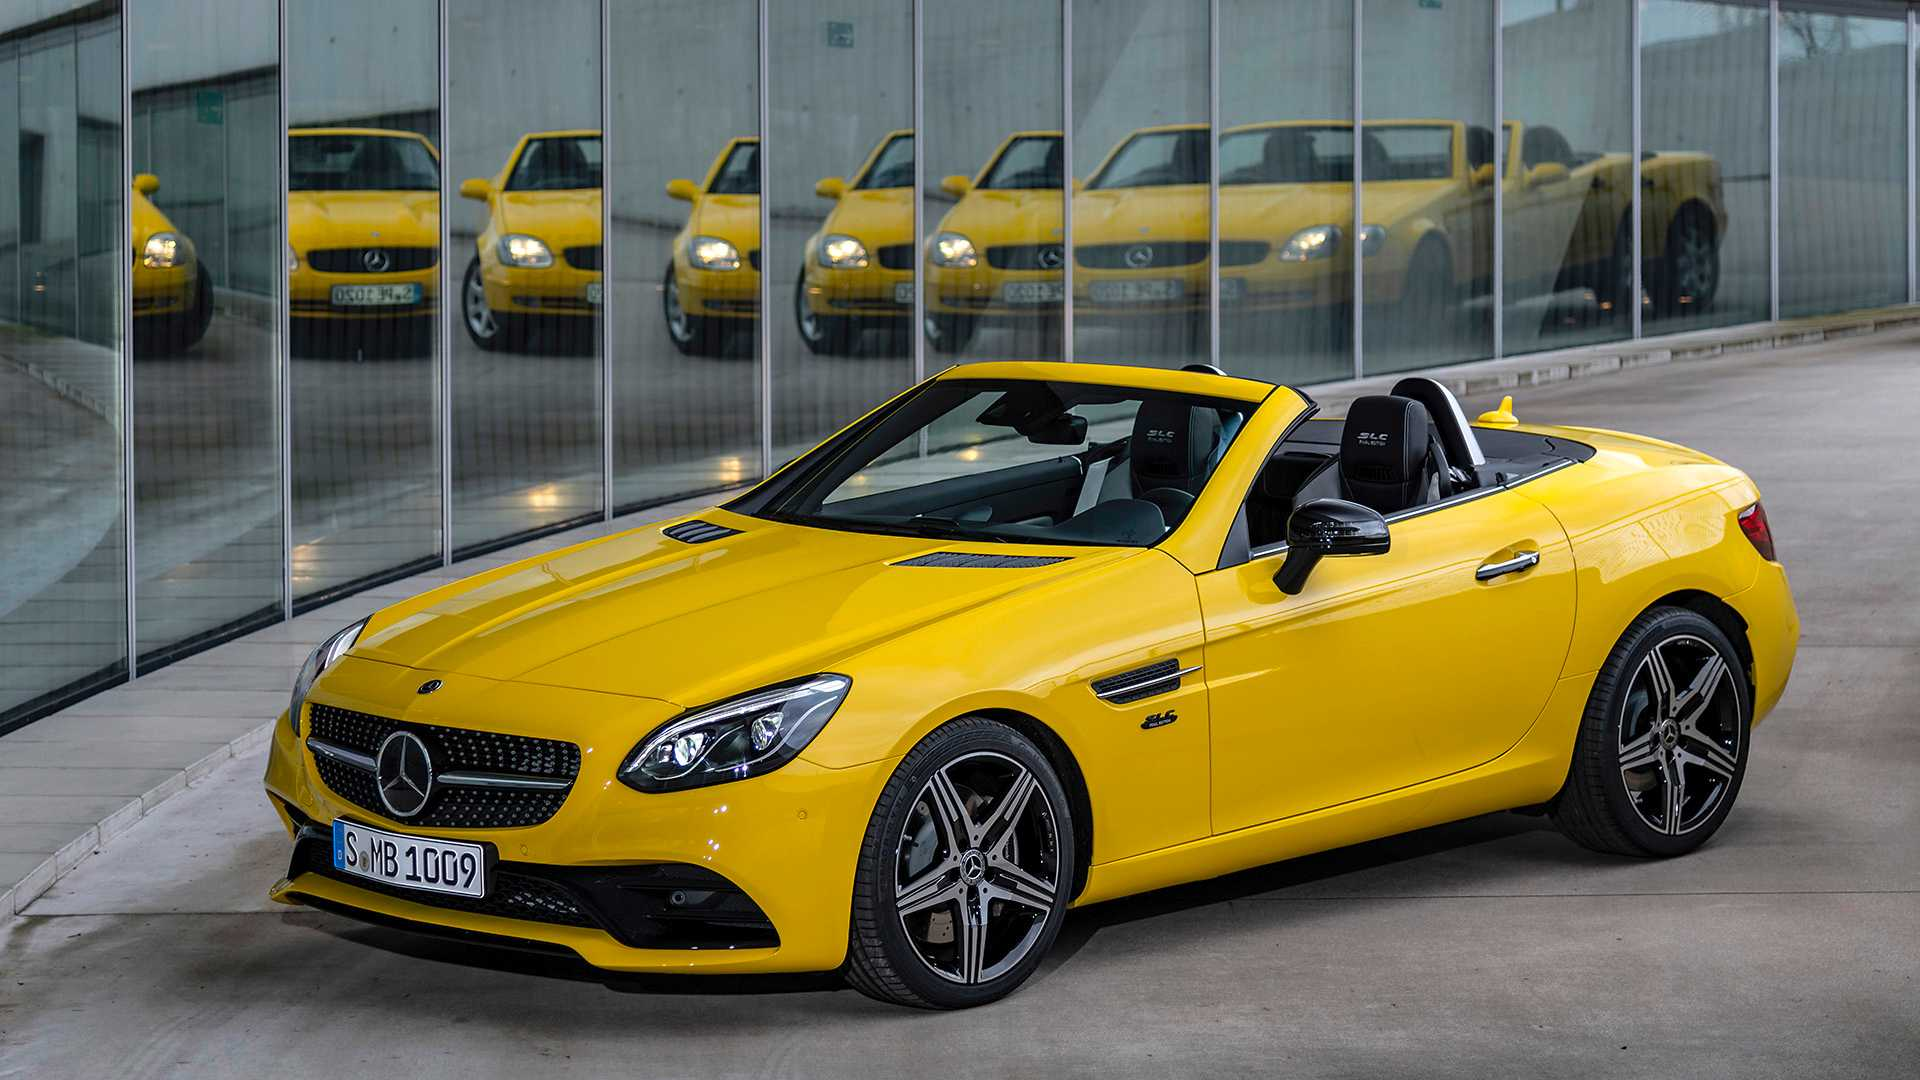 Mevcut jenerasyon Mercedes SLC'nin son versiyonu tanıtıldı